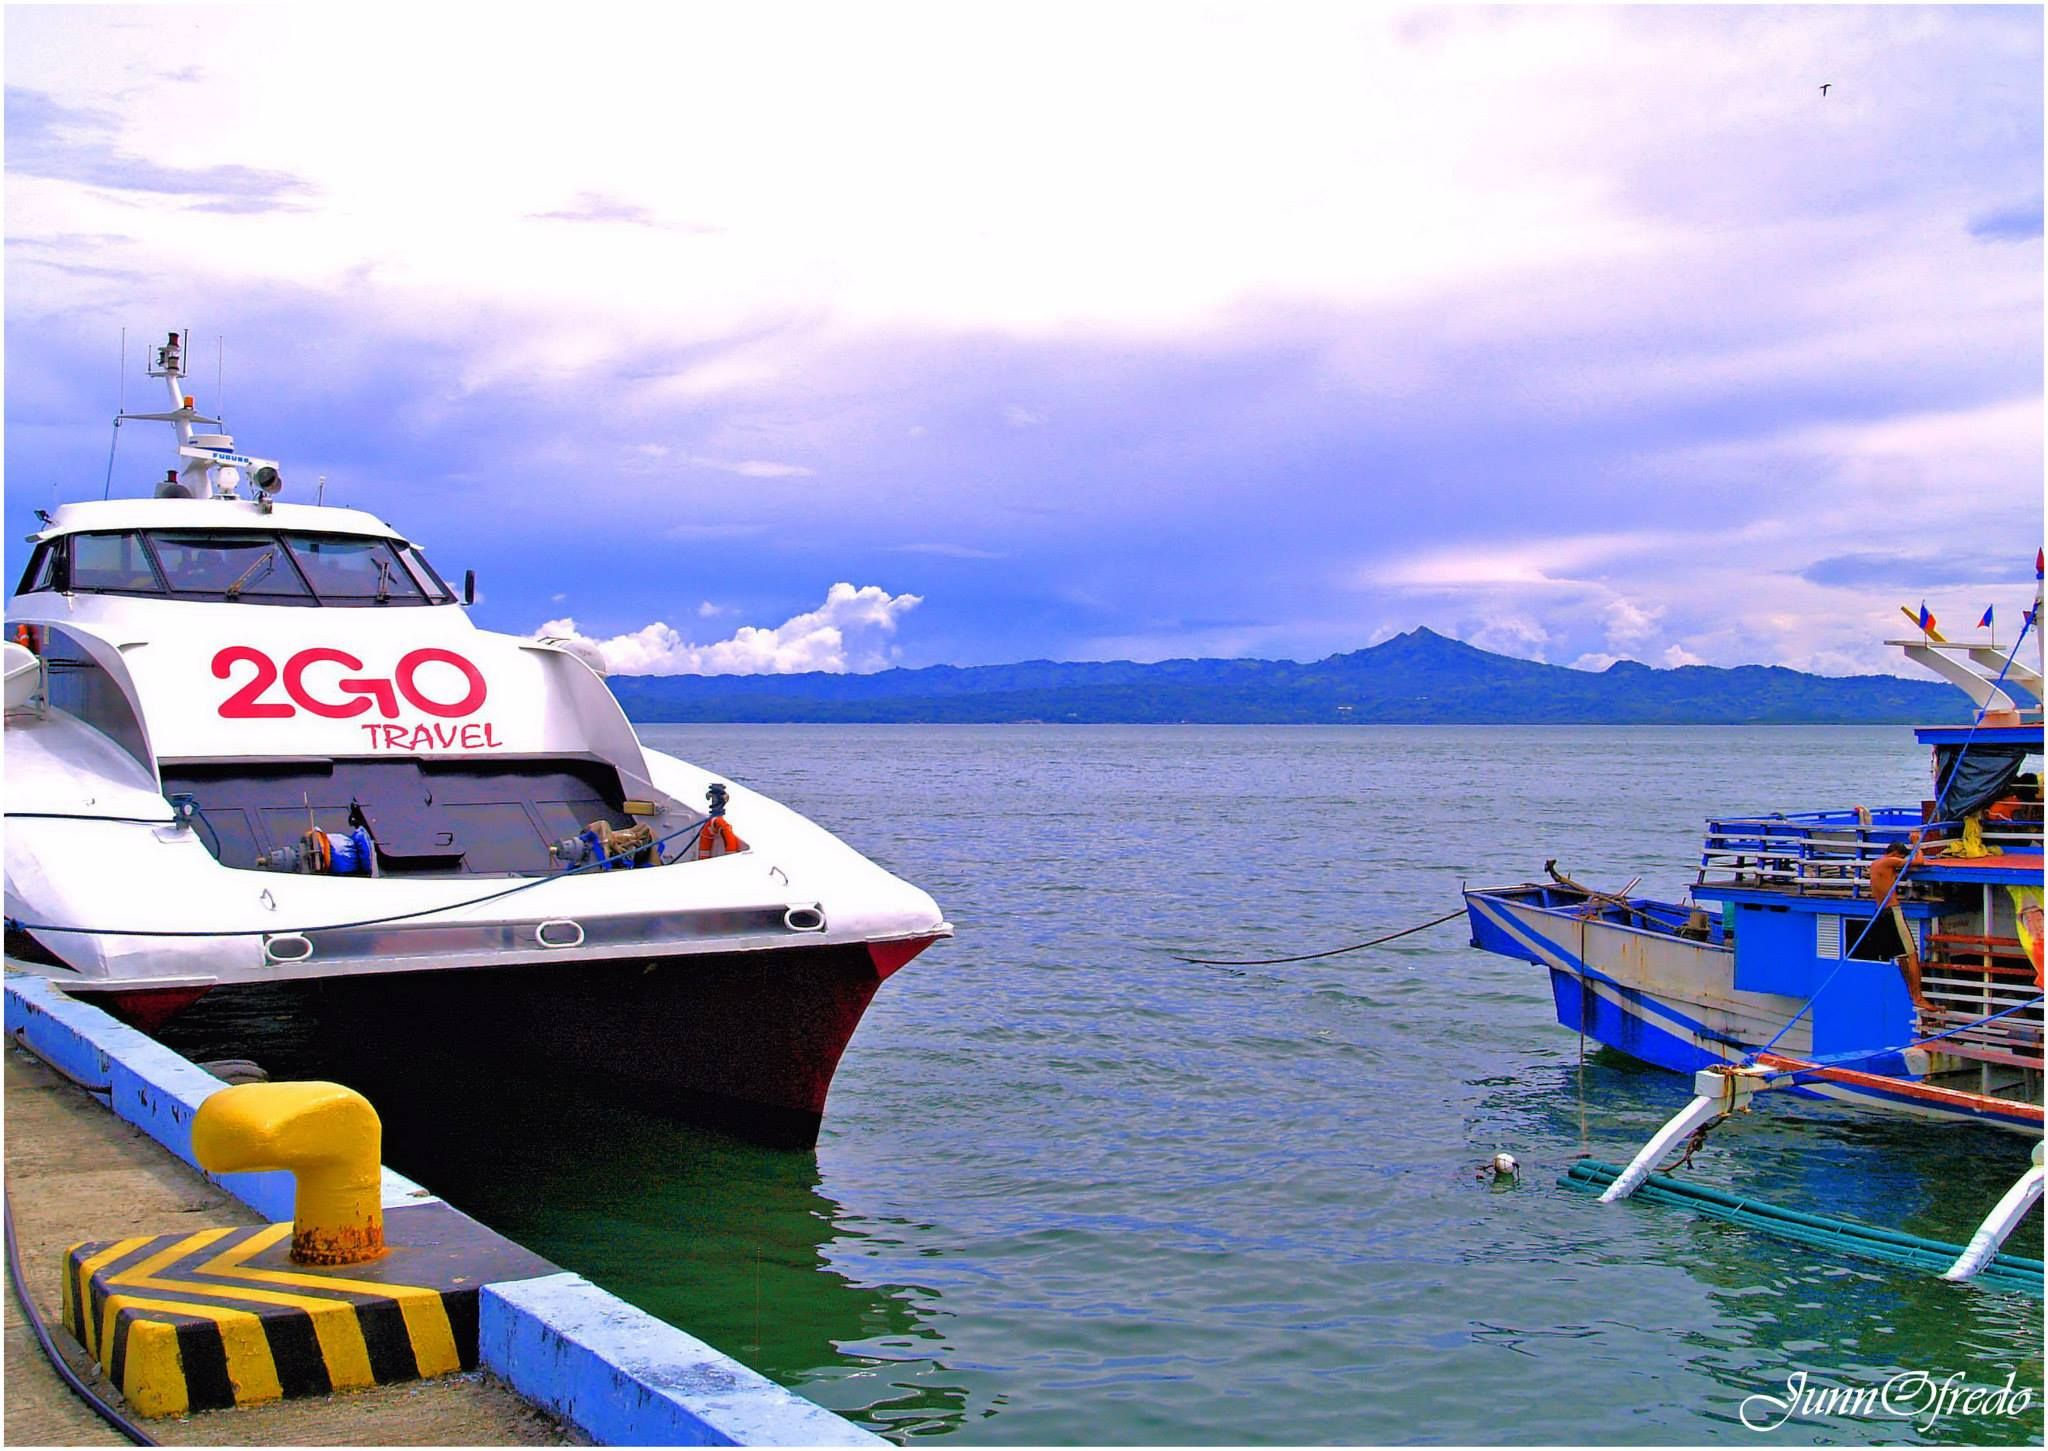 fastcraft one of sea transfortation in ormoc